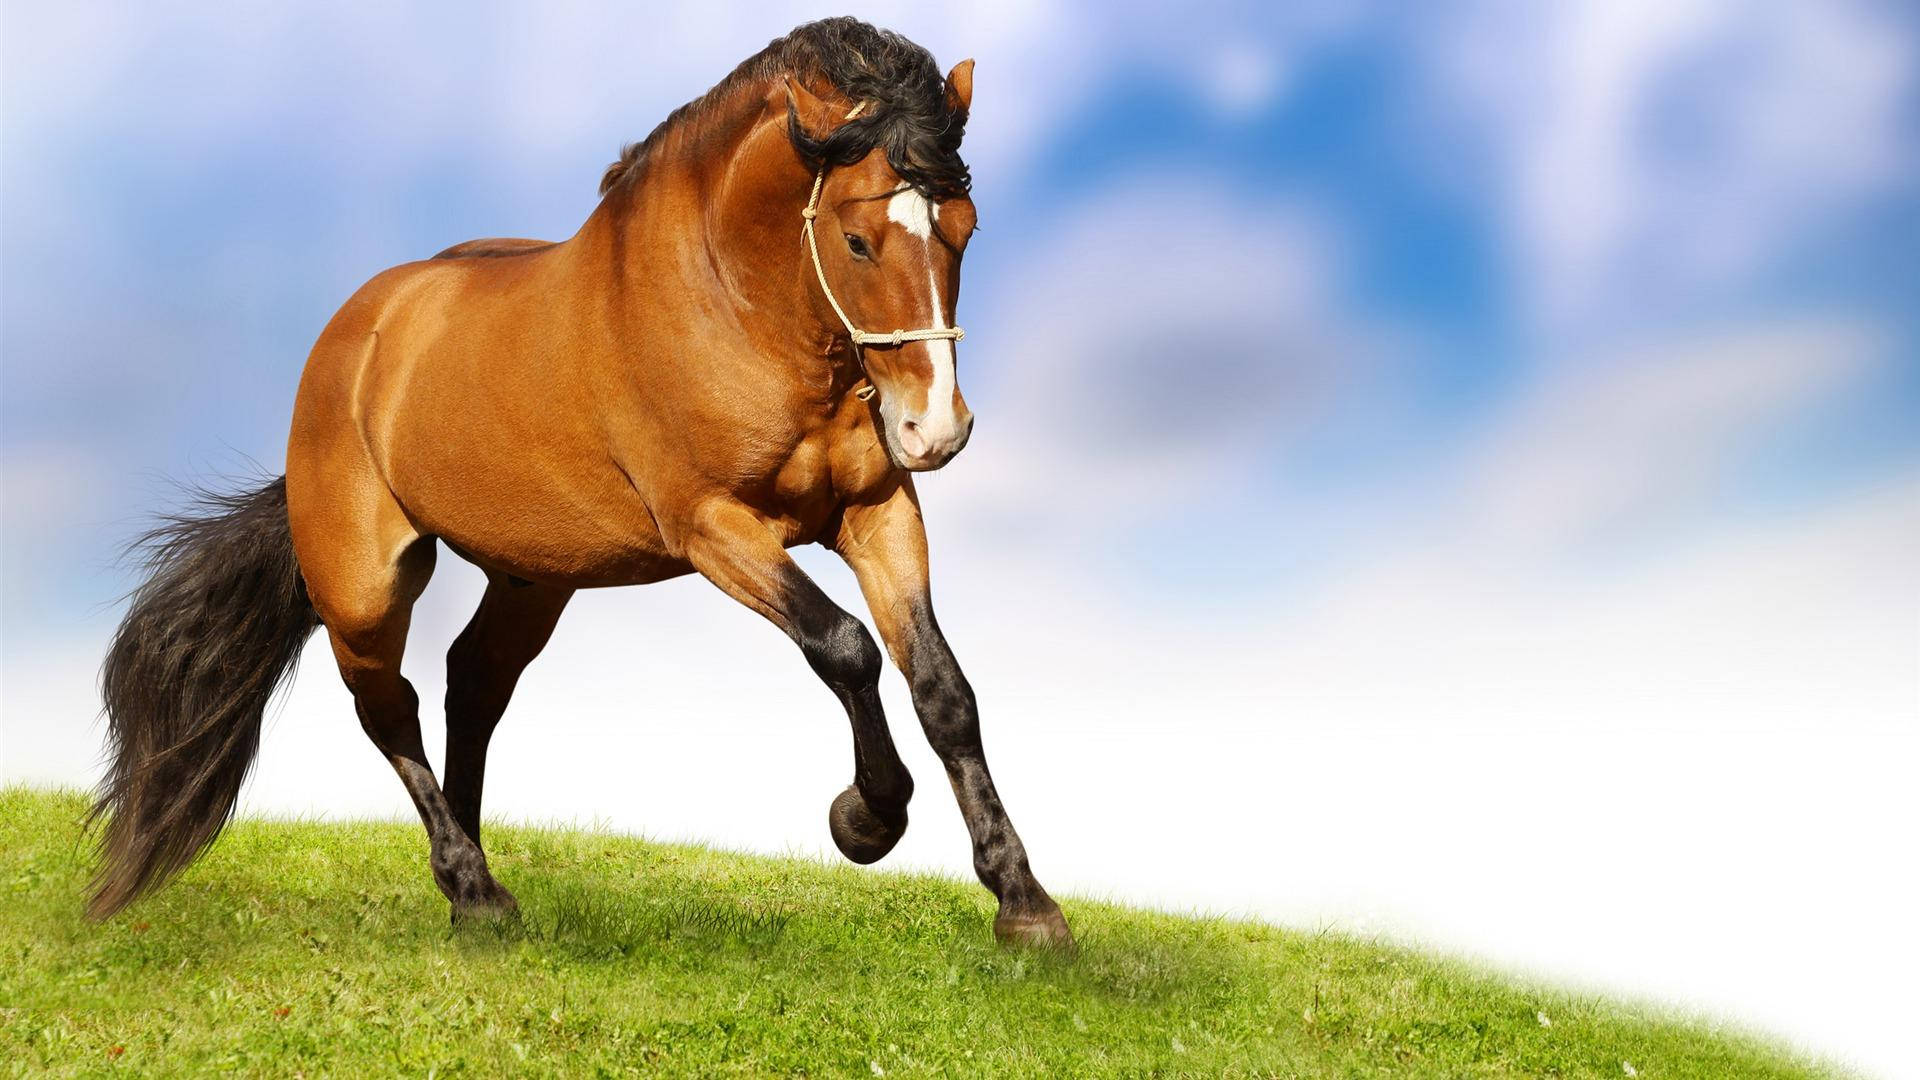 48 Running Horses Wallpaper On Wallpapersafari